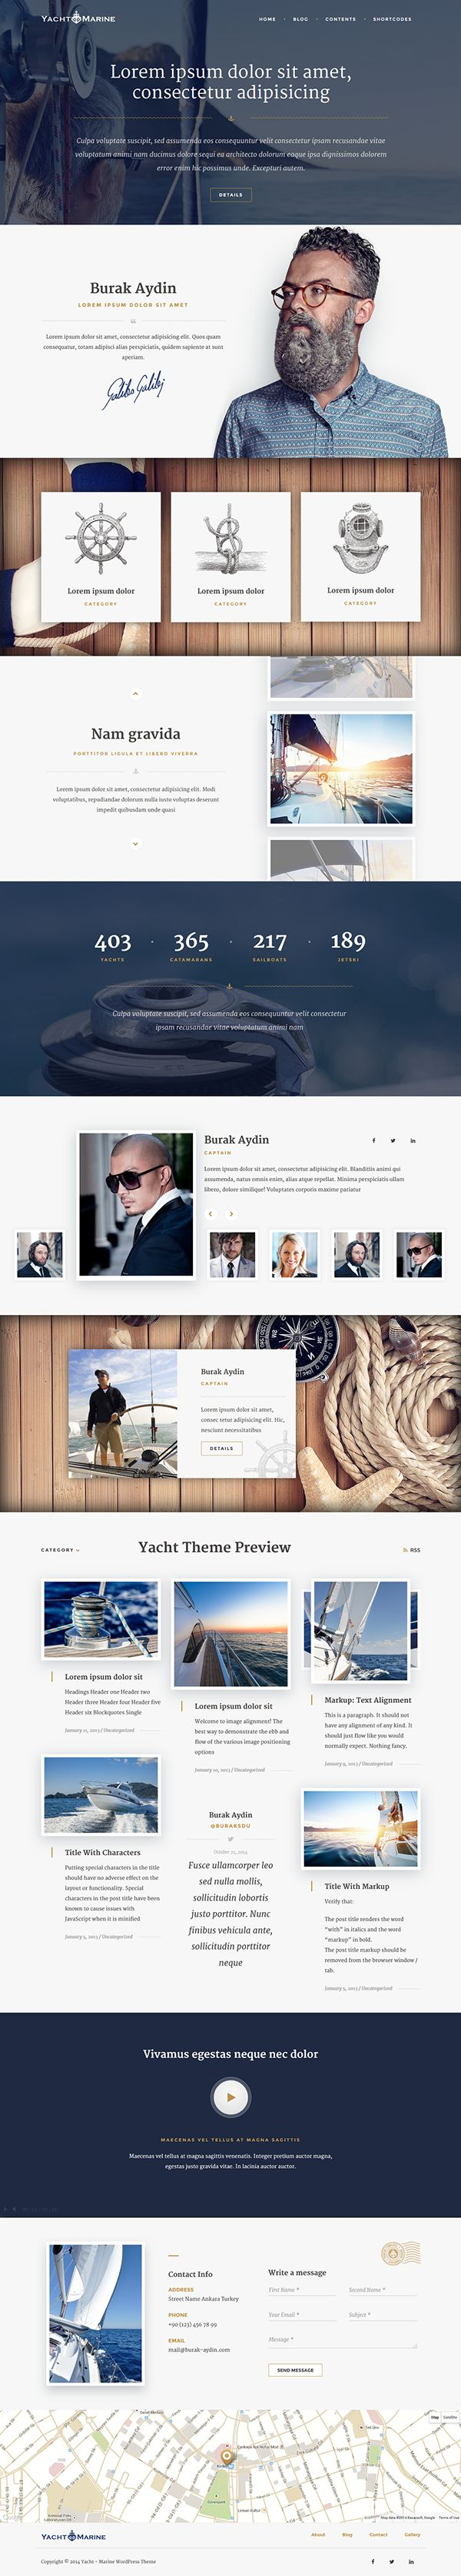 Yacht - Marine WordPress Theme on Behance #wedesign #web #design #layout #userinterface #website < repinned by Alexander Kaiser | visit www.kaiser-alexander.de